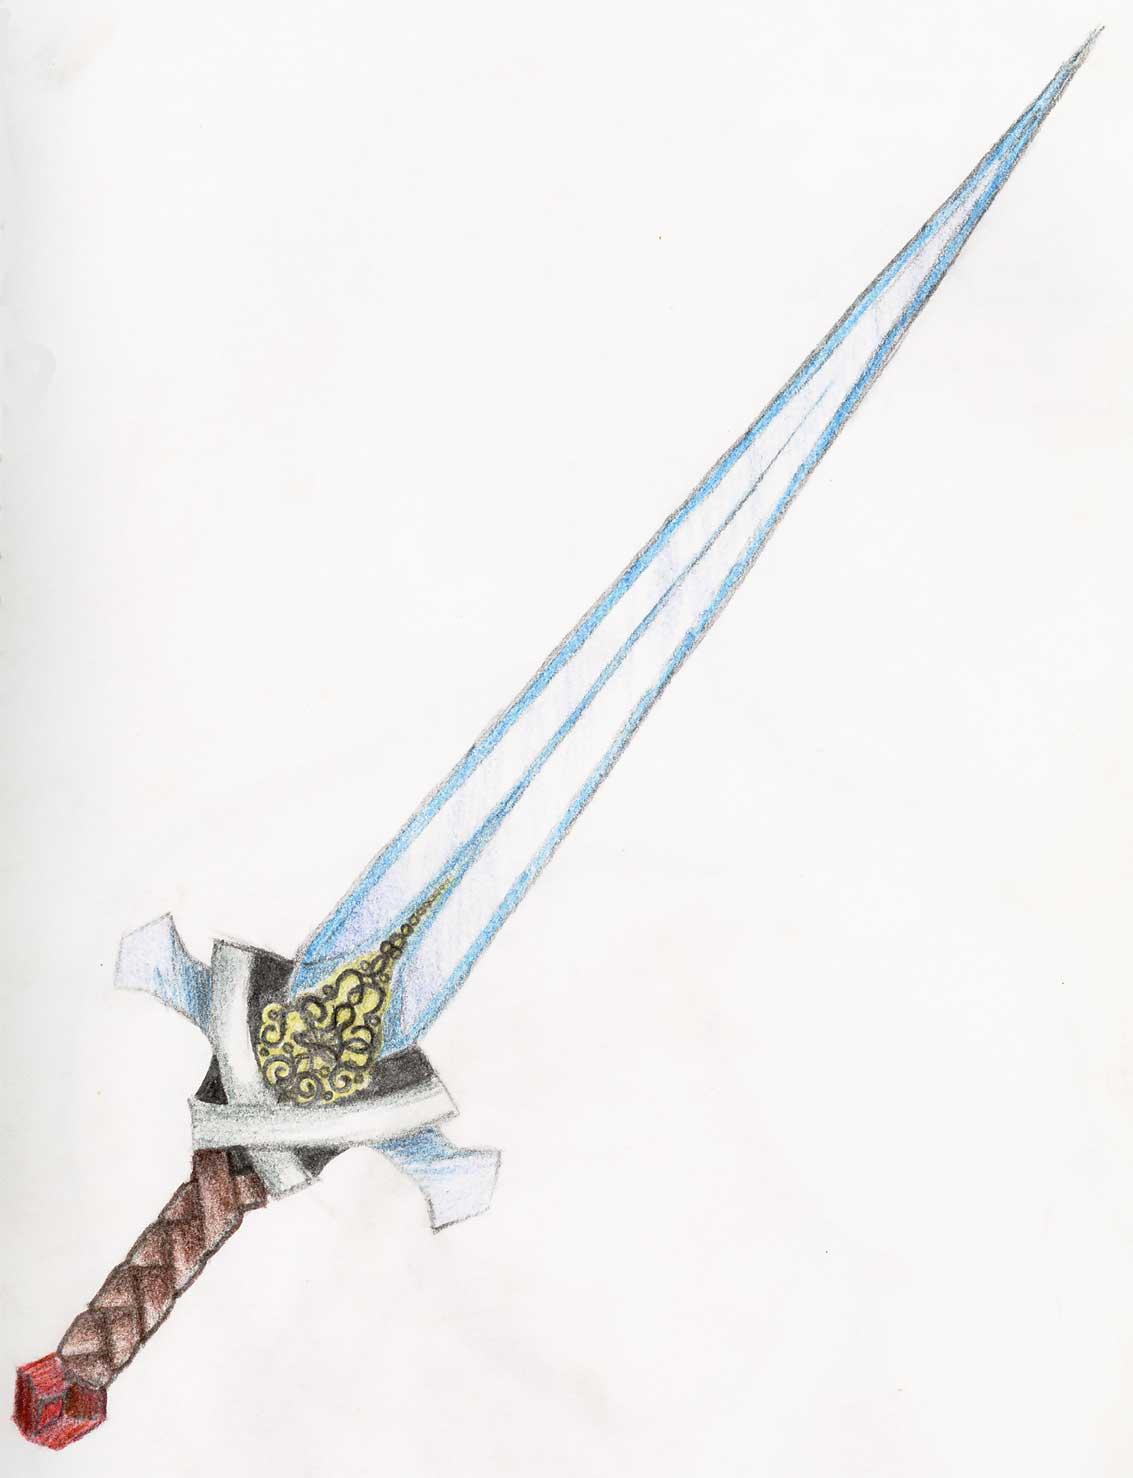 Sword by bluetigerkitty on deviantART